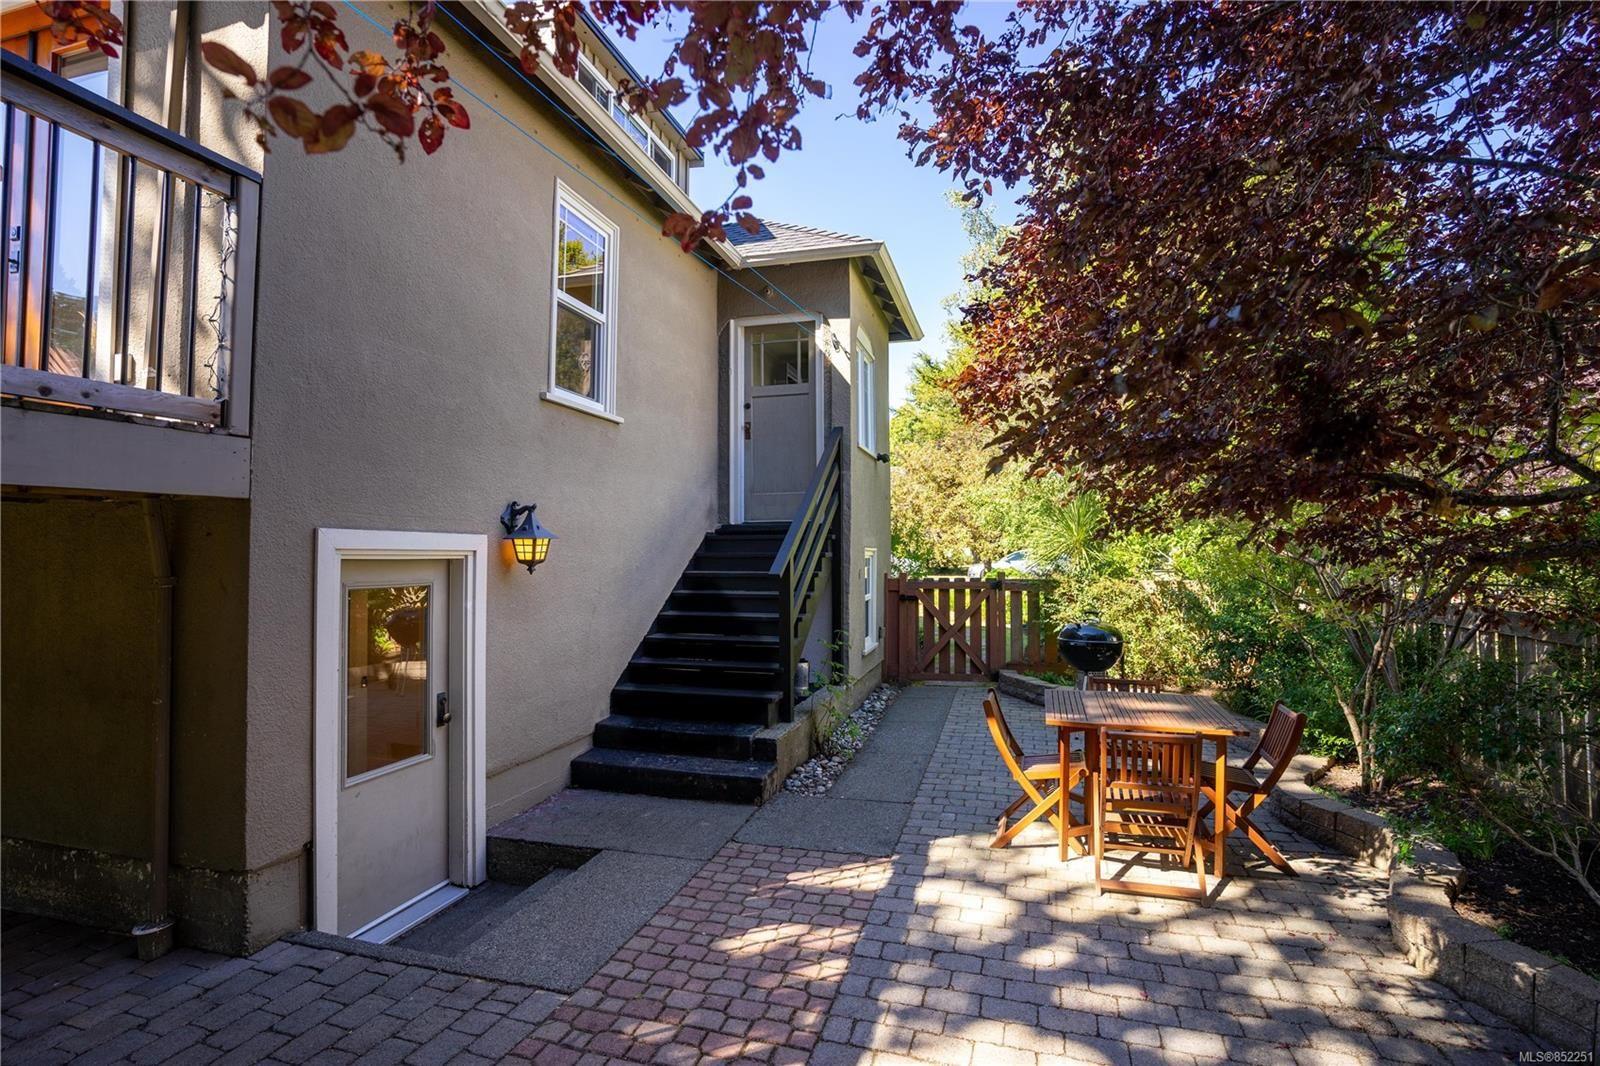 Photo 33: Photos: 2363 Pacific Ave in : OB Estevan House for sale (Oak Bay)  : MLS®# 852251